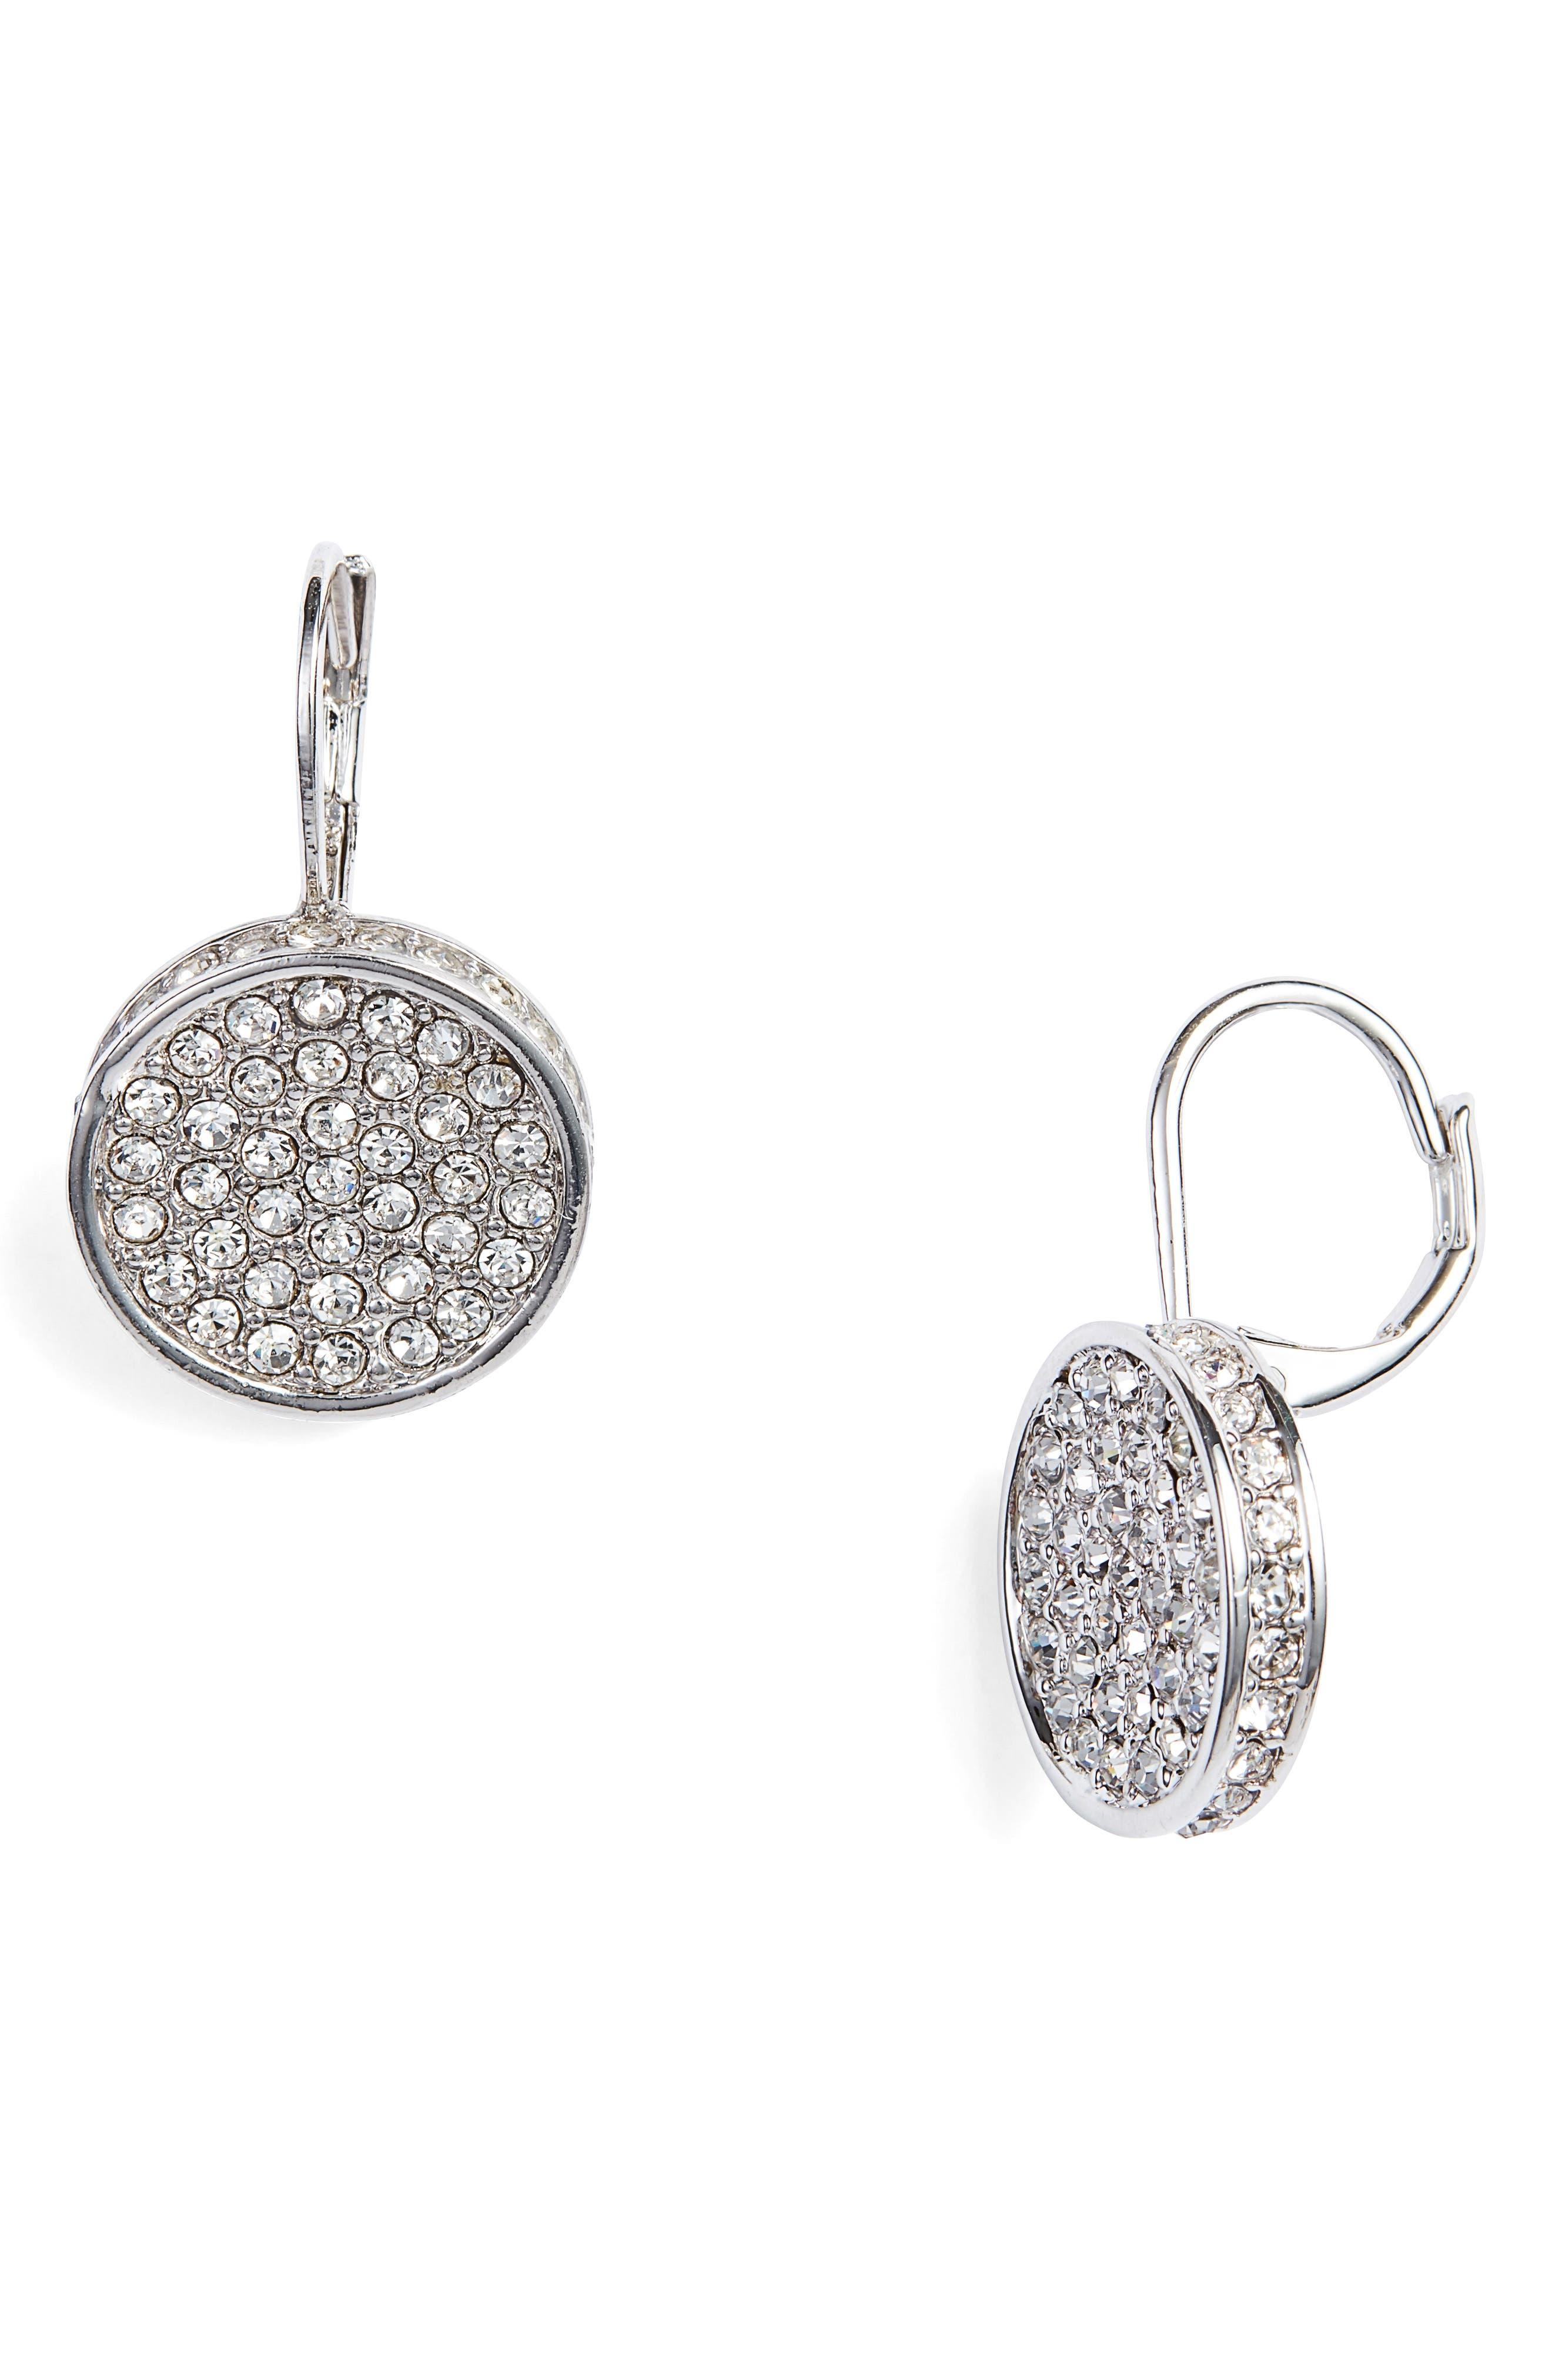 Crystal Glitter Earrings,                         Main,                         color, Silver/ Crystal